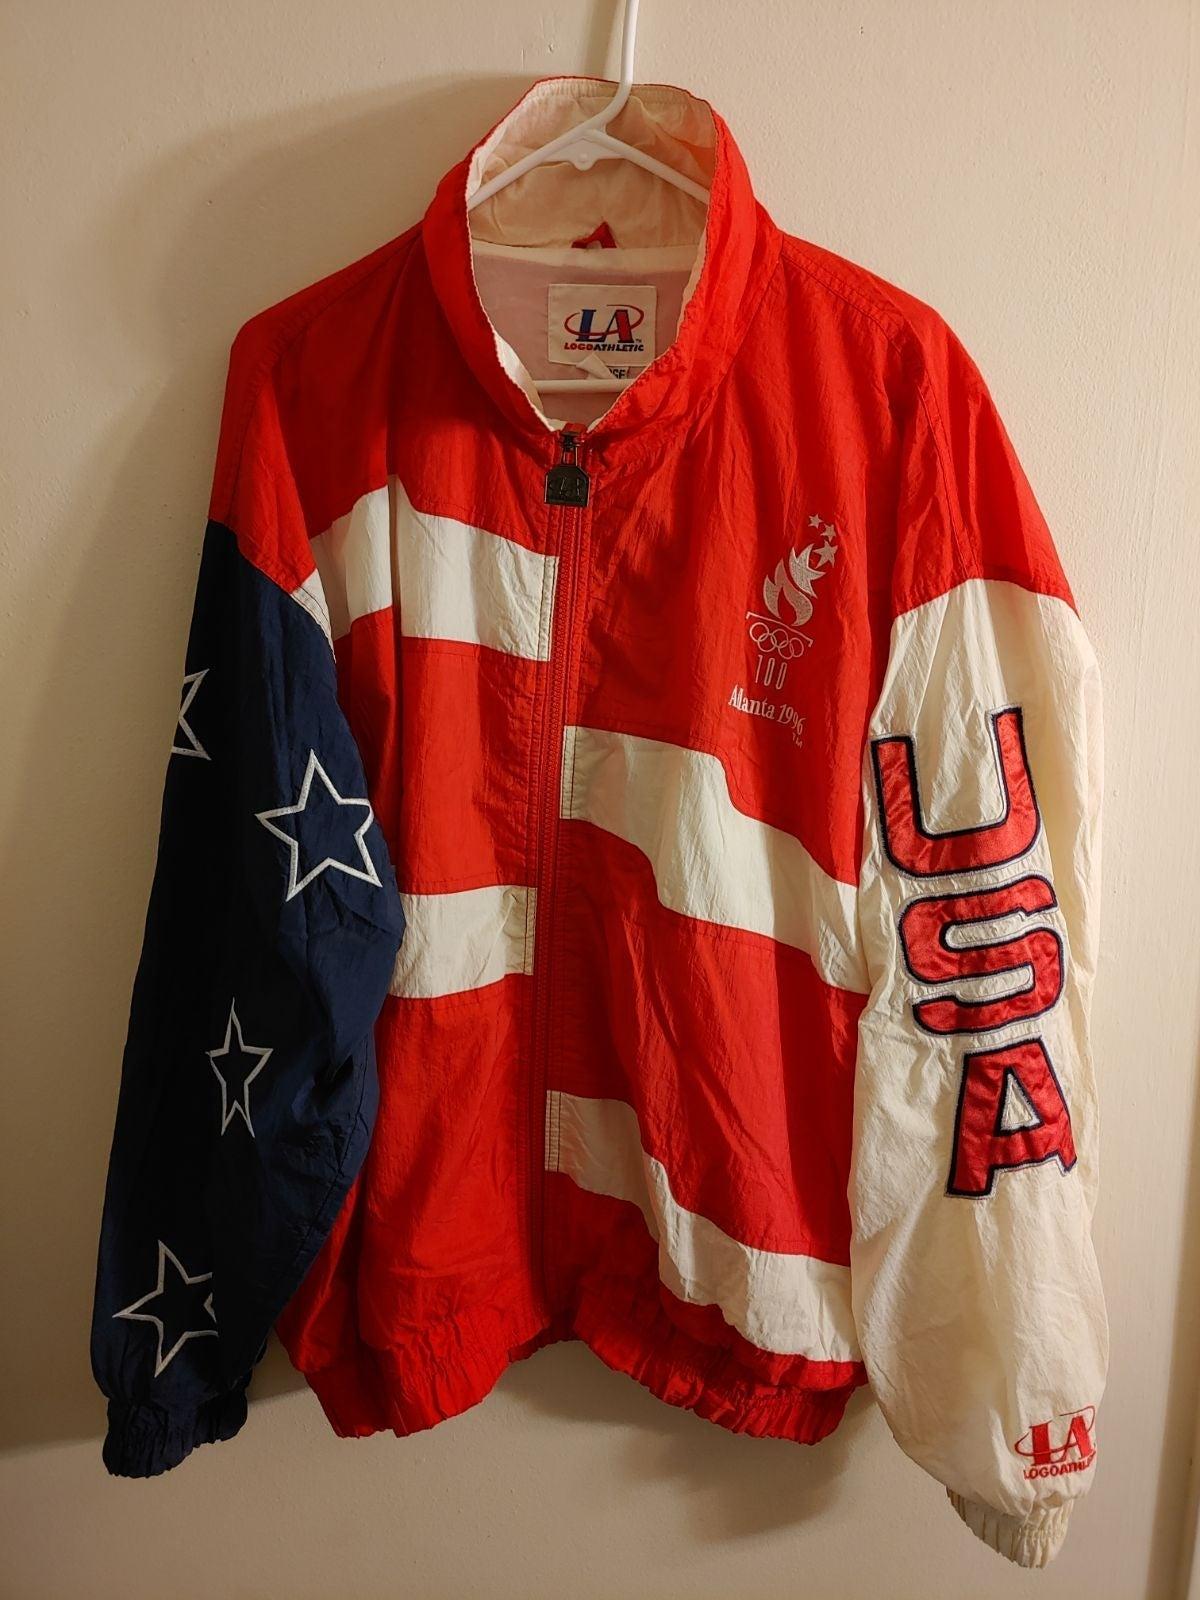 VTG 90s ATLANTA OLYMPICS USA Jacket XL